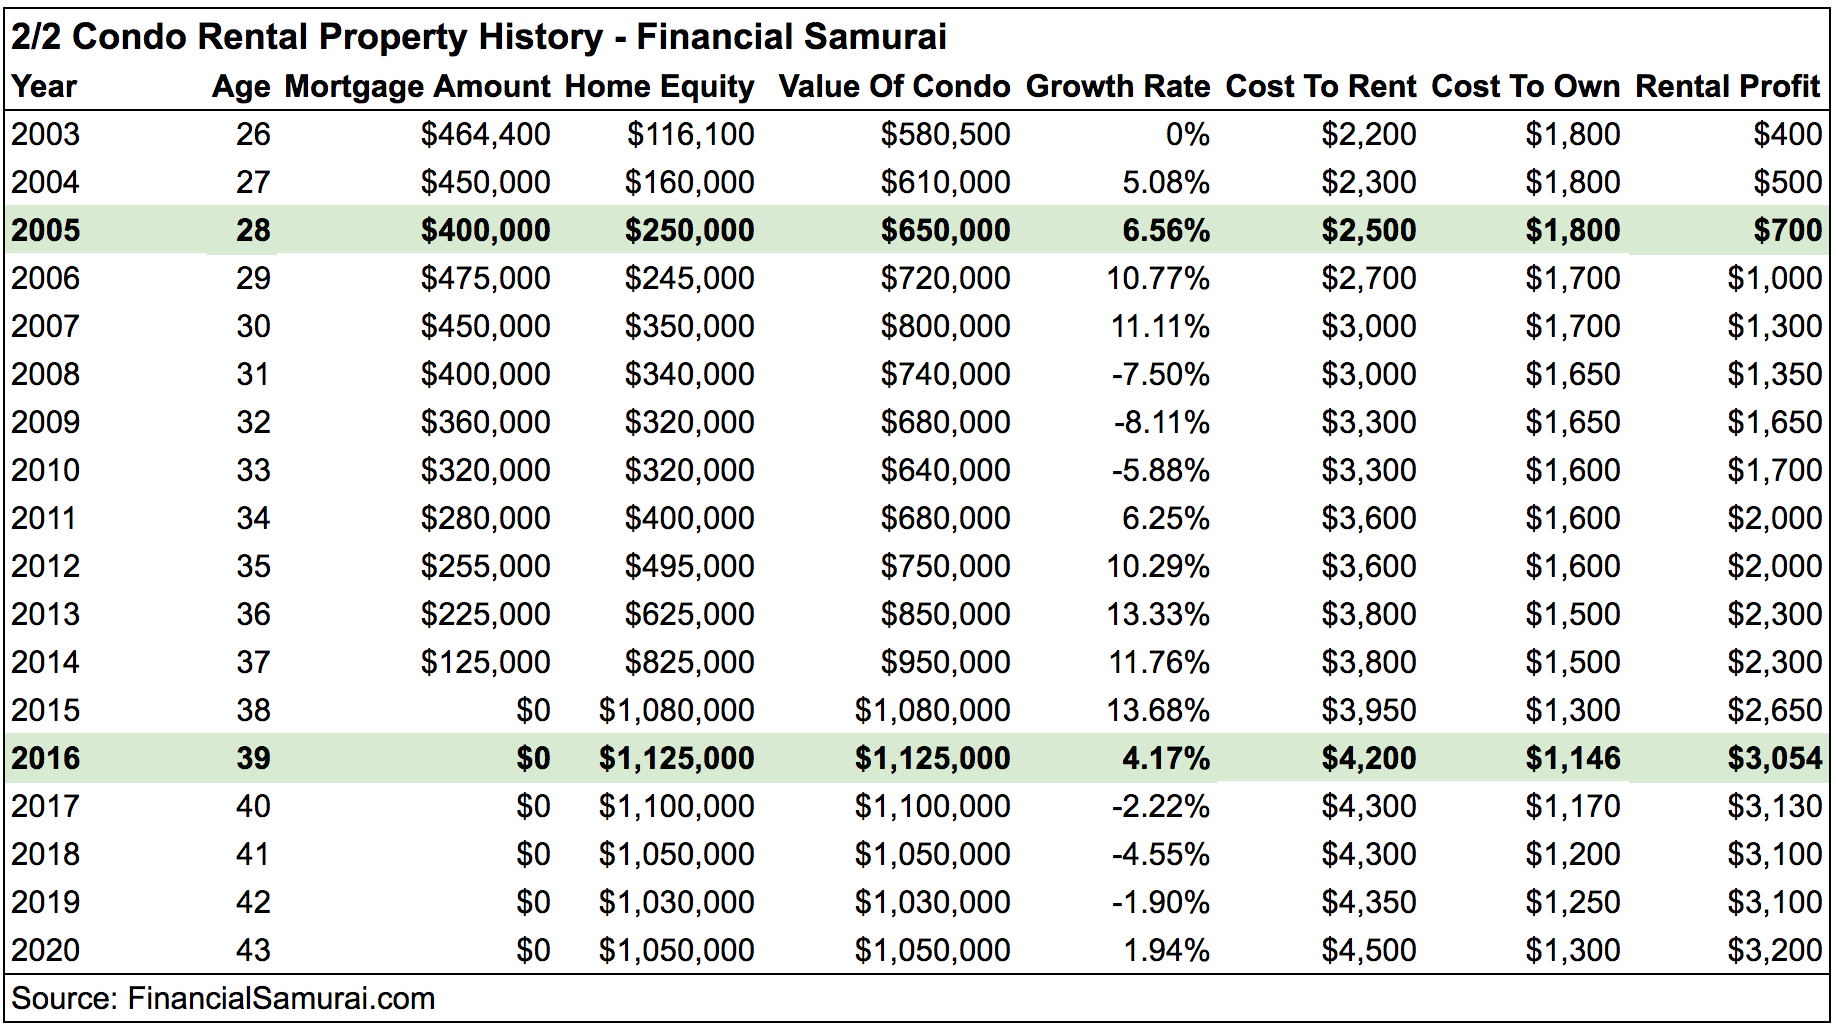 Financial Samurai Condo Rental Property History Income Statement - I had the best tenants